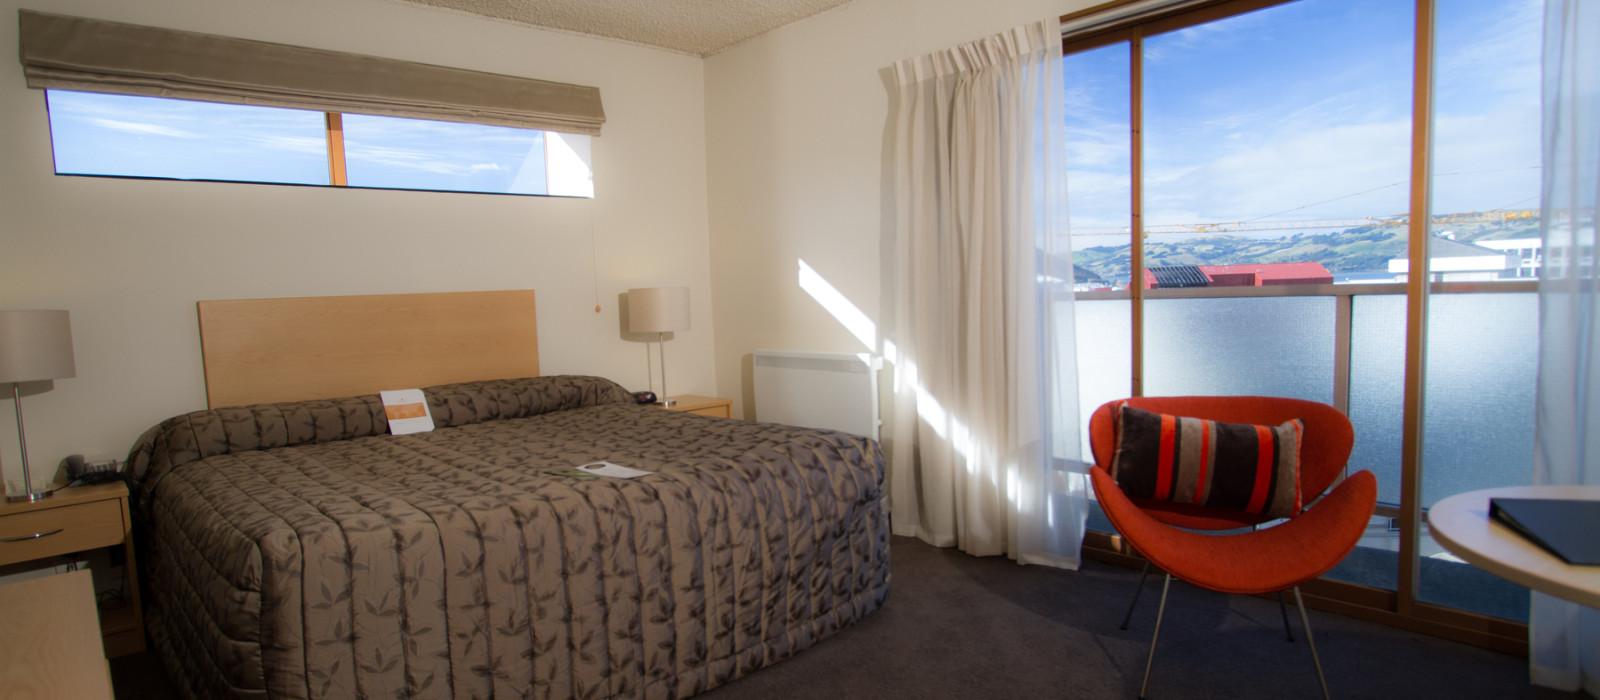 Hotel Kingsgate  Dunedin Neuseeland